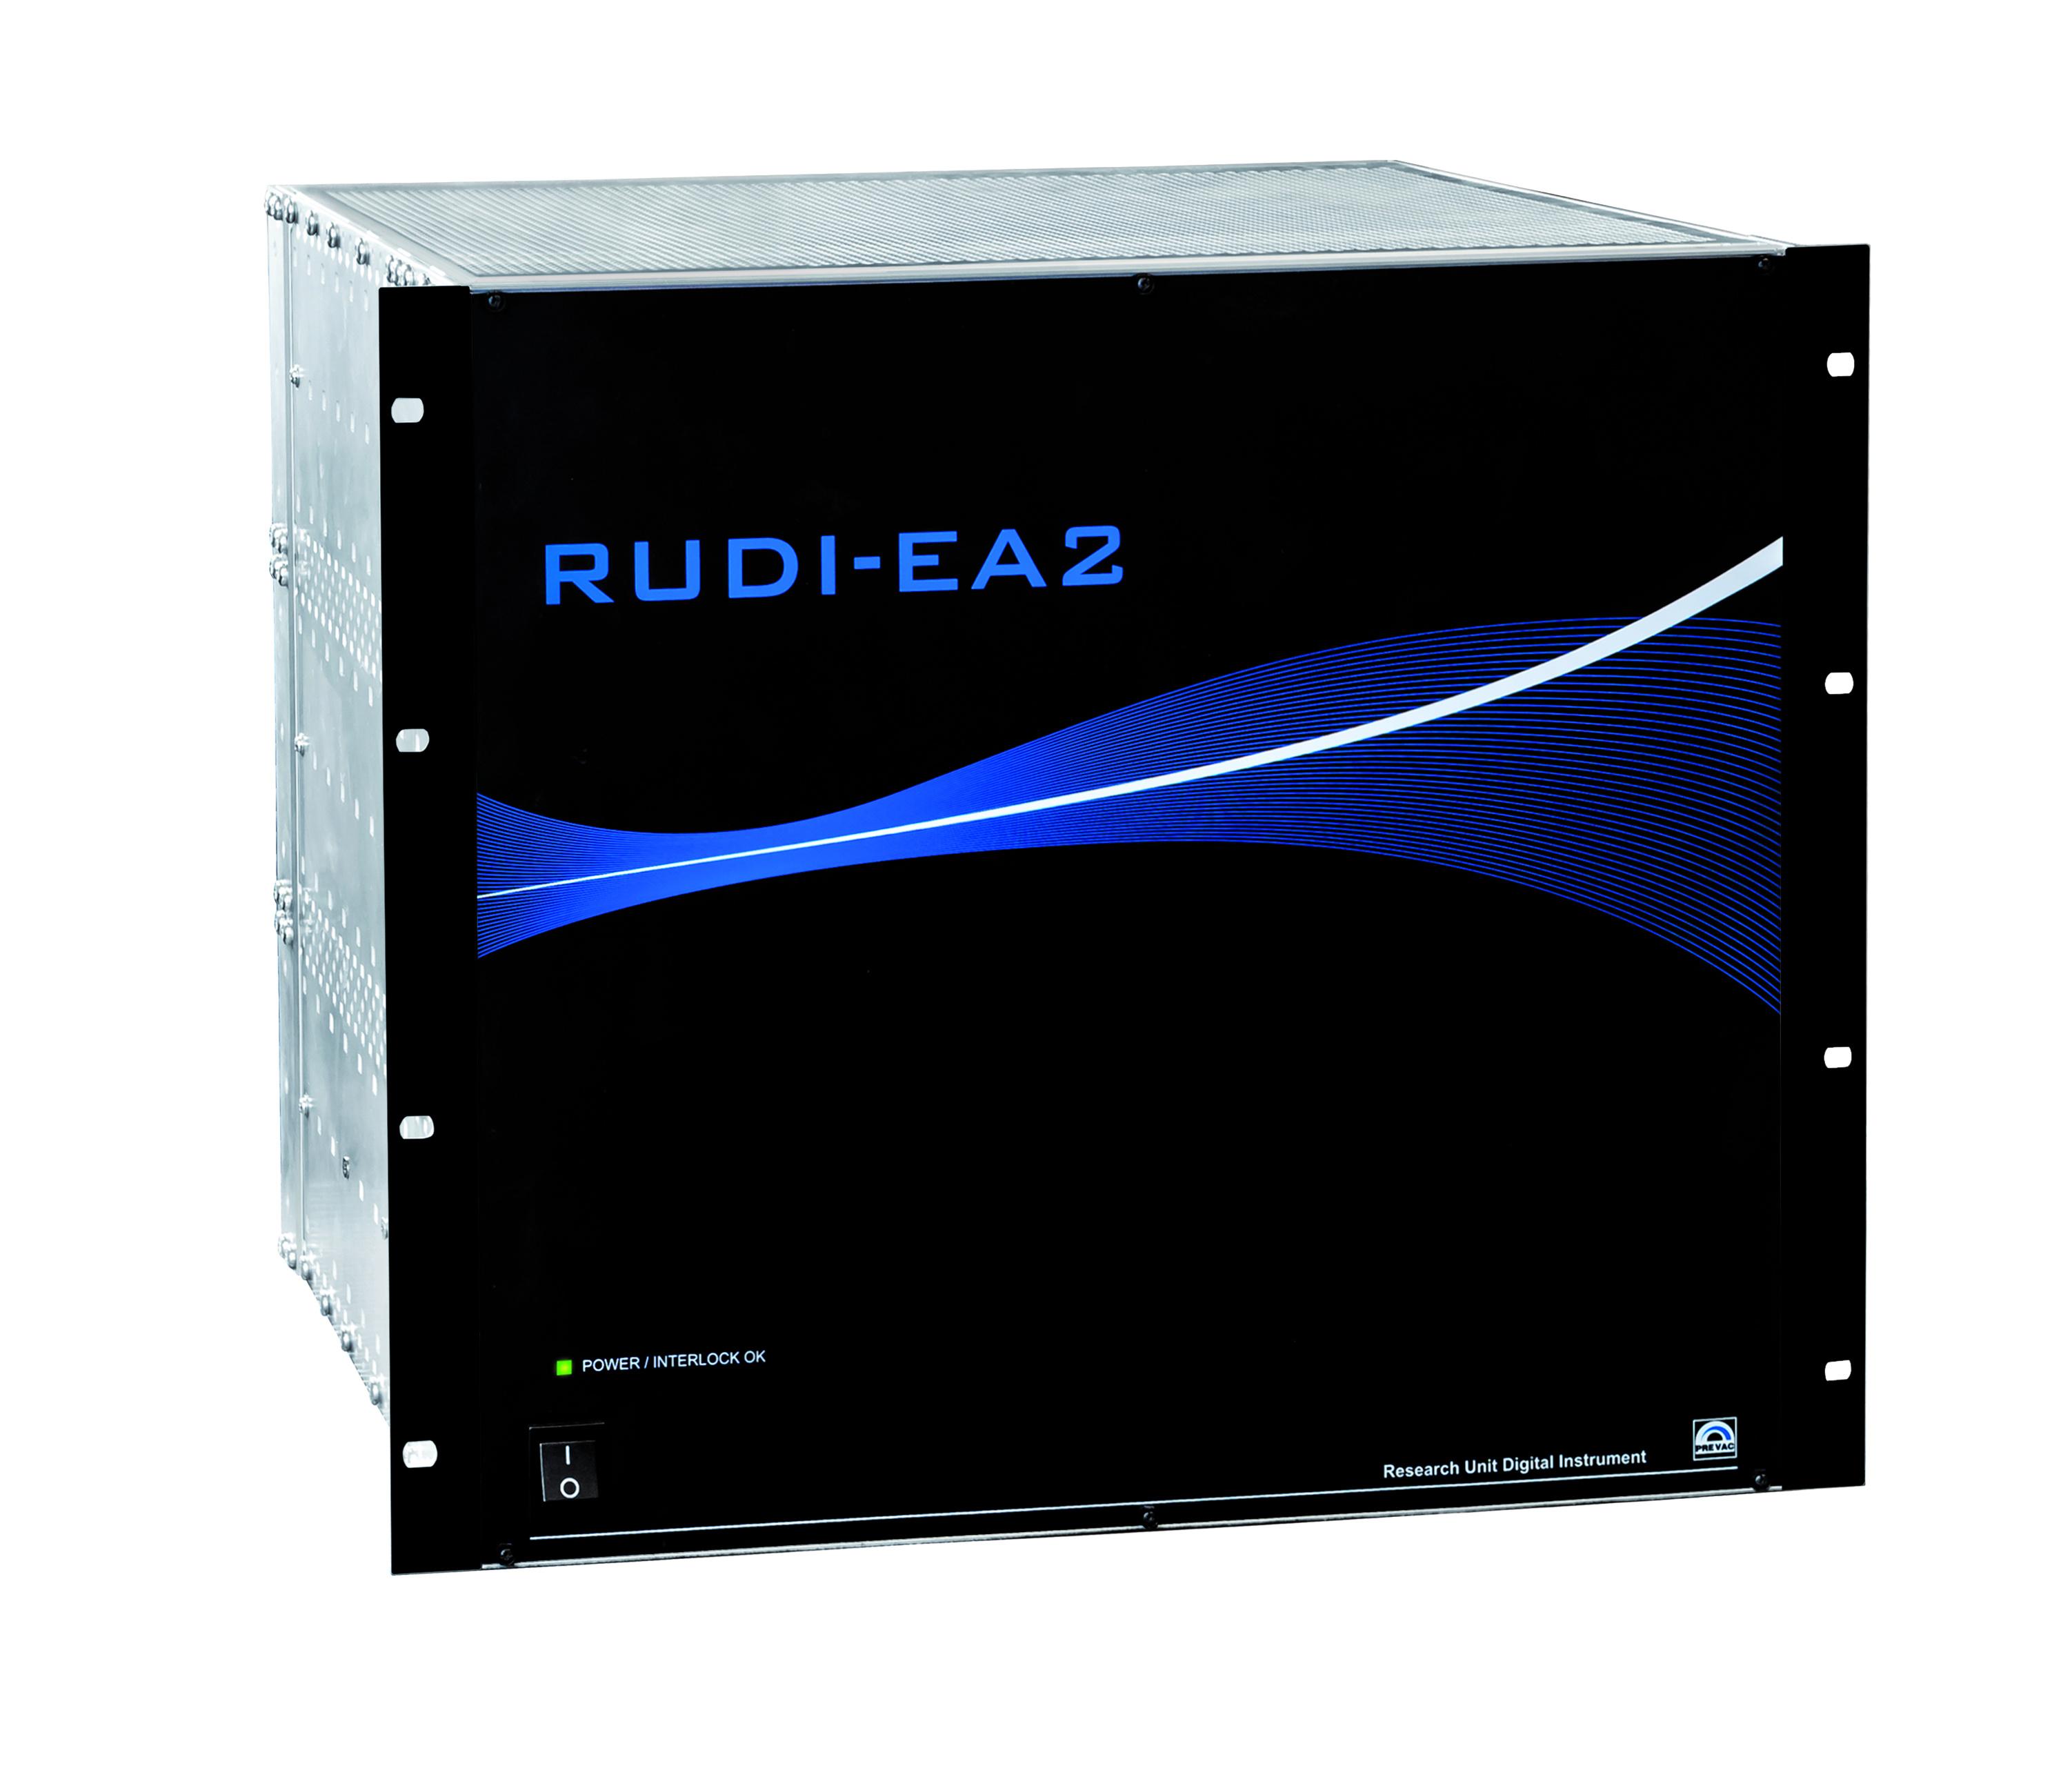 RUDI-EA2